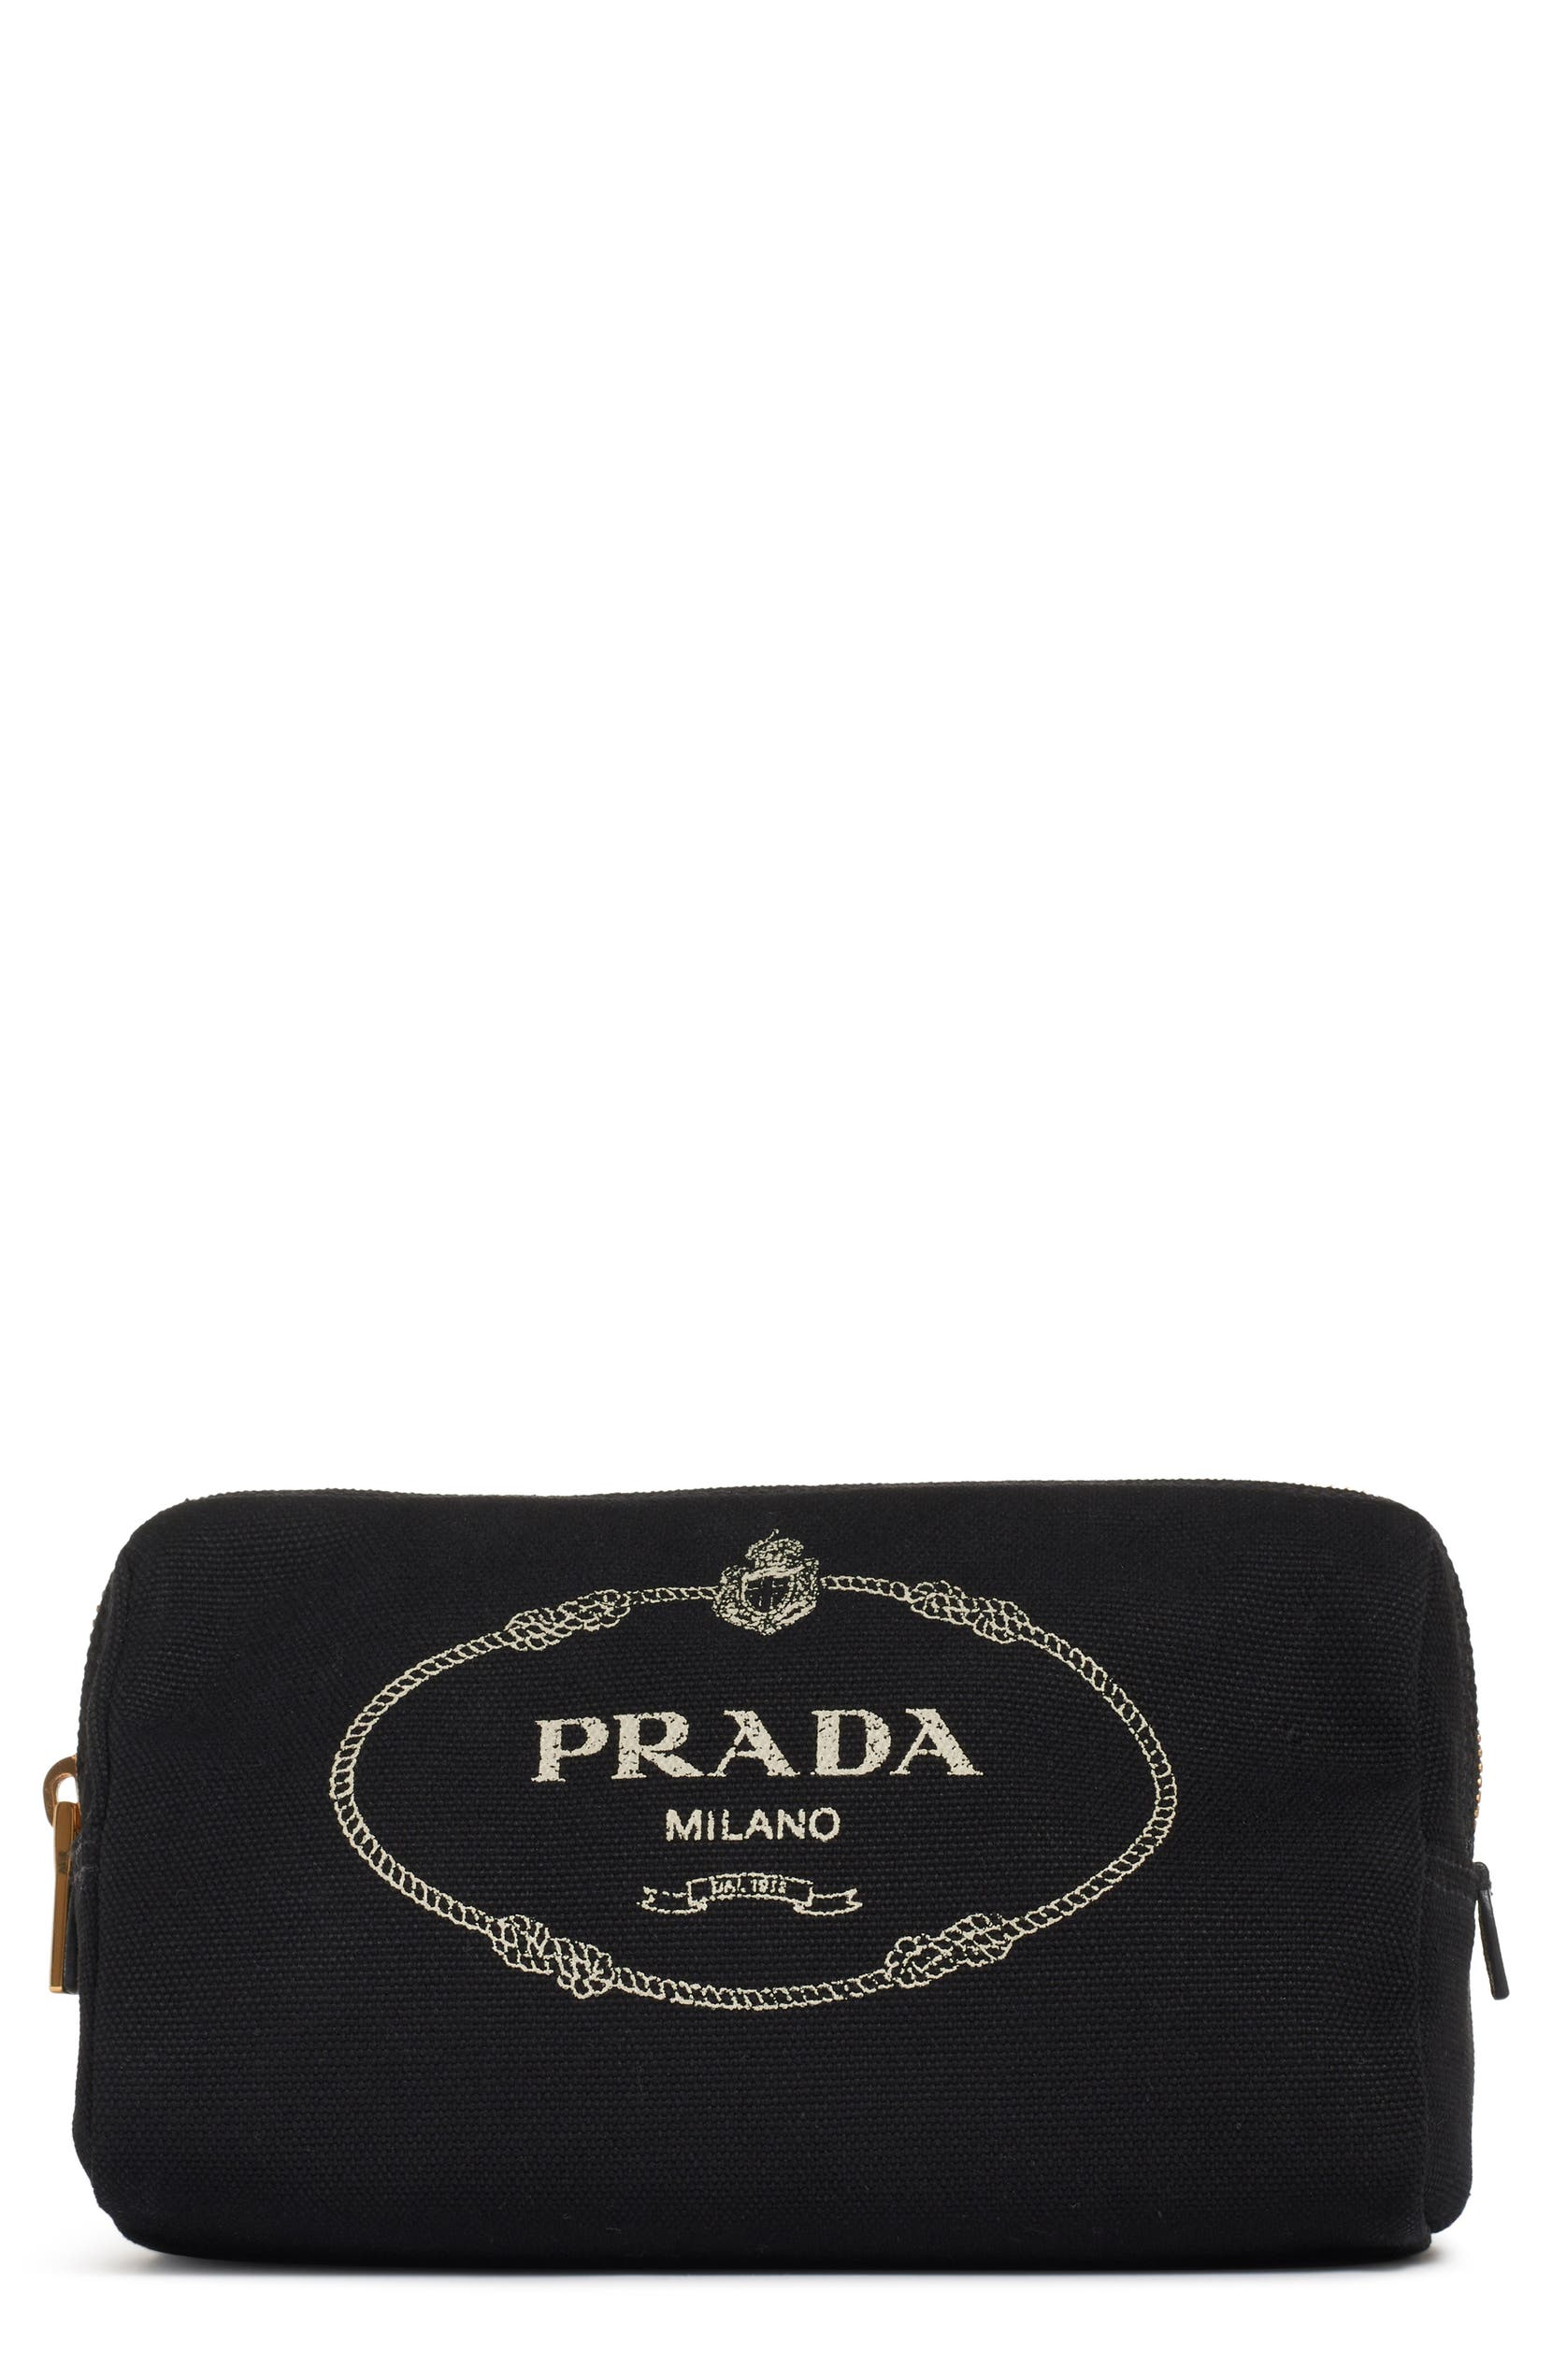 7d12ea917484 Prada Logo Canvas Cosmetic Pouch | Nordstrom